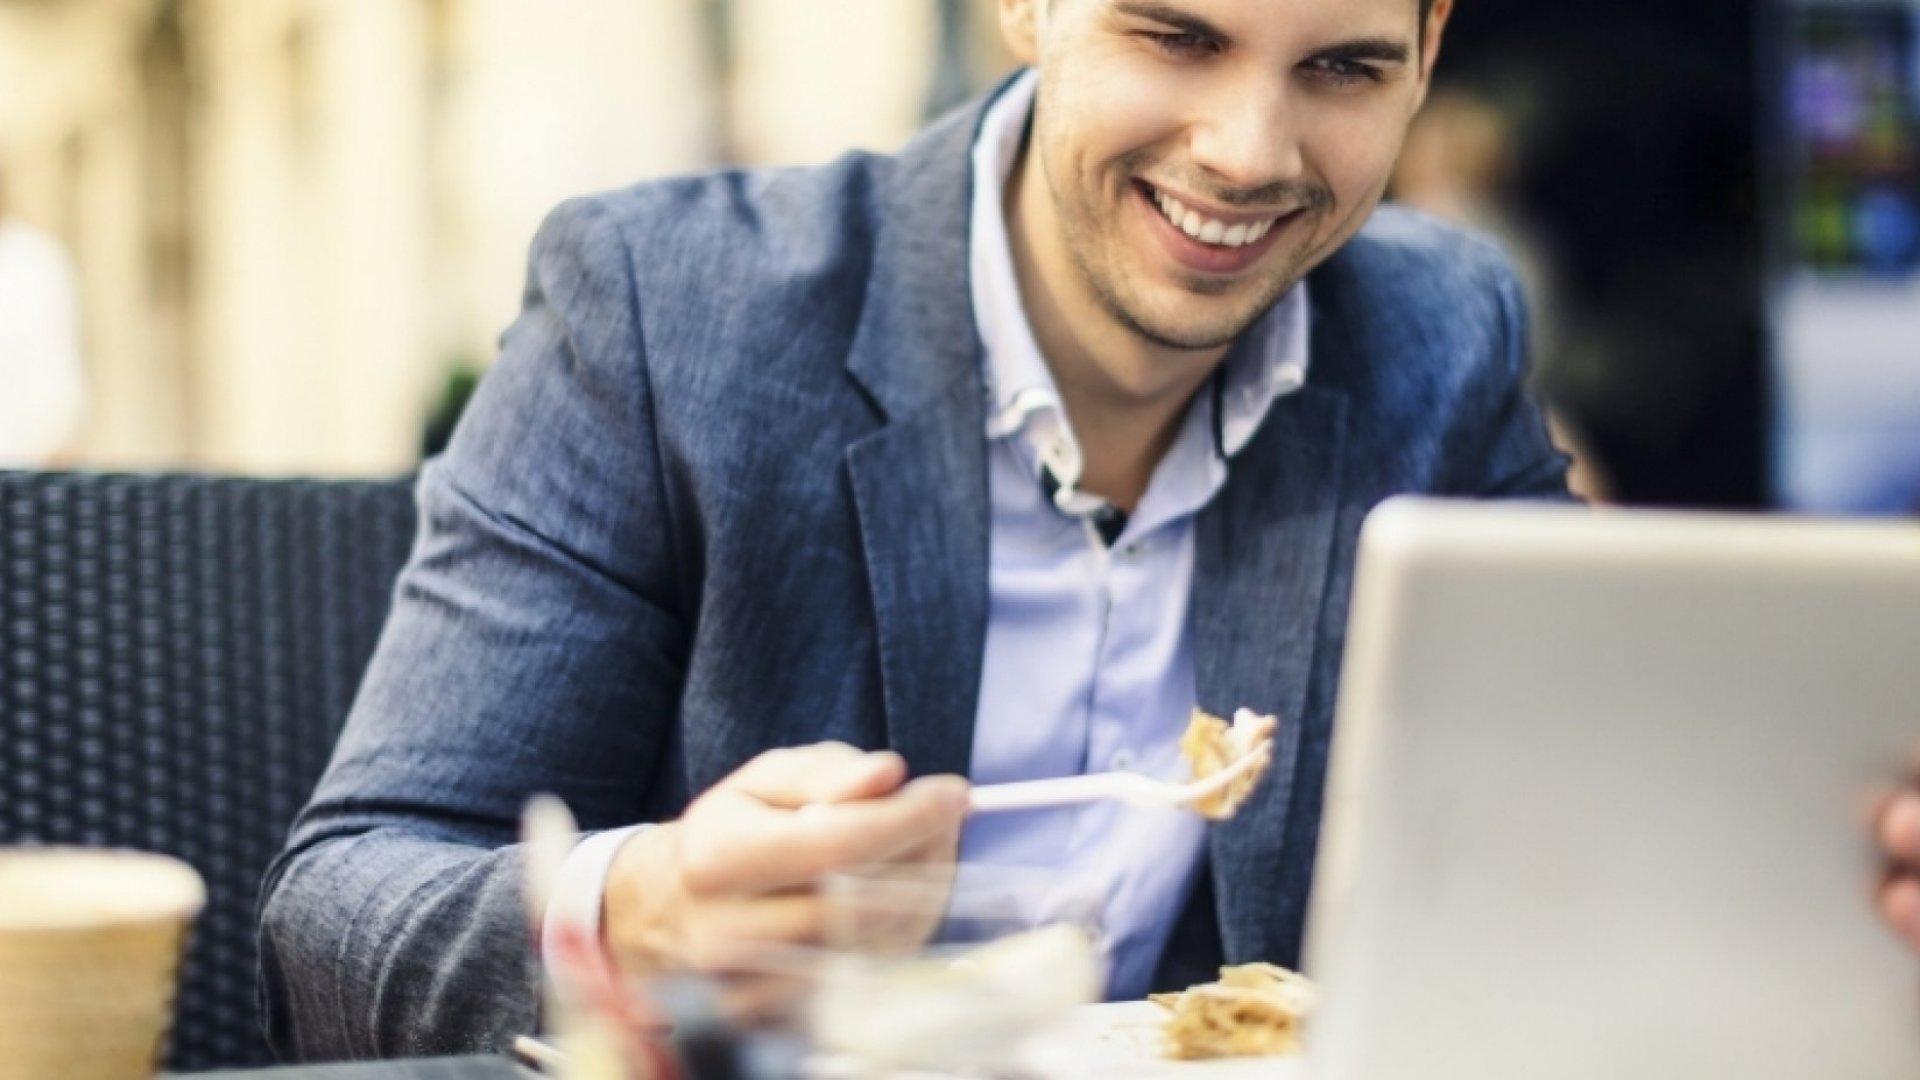 5 Brilliant Content Marketing Techniques That Connect With Millennials